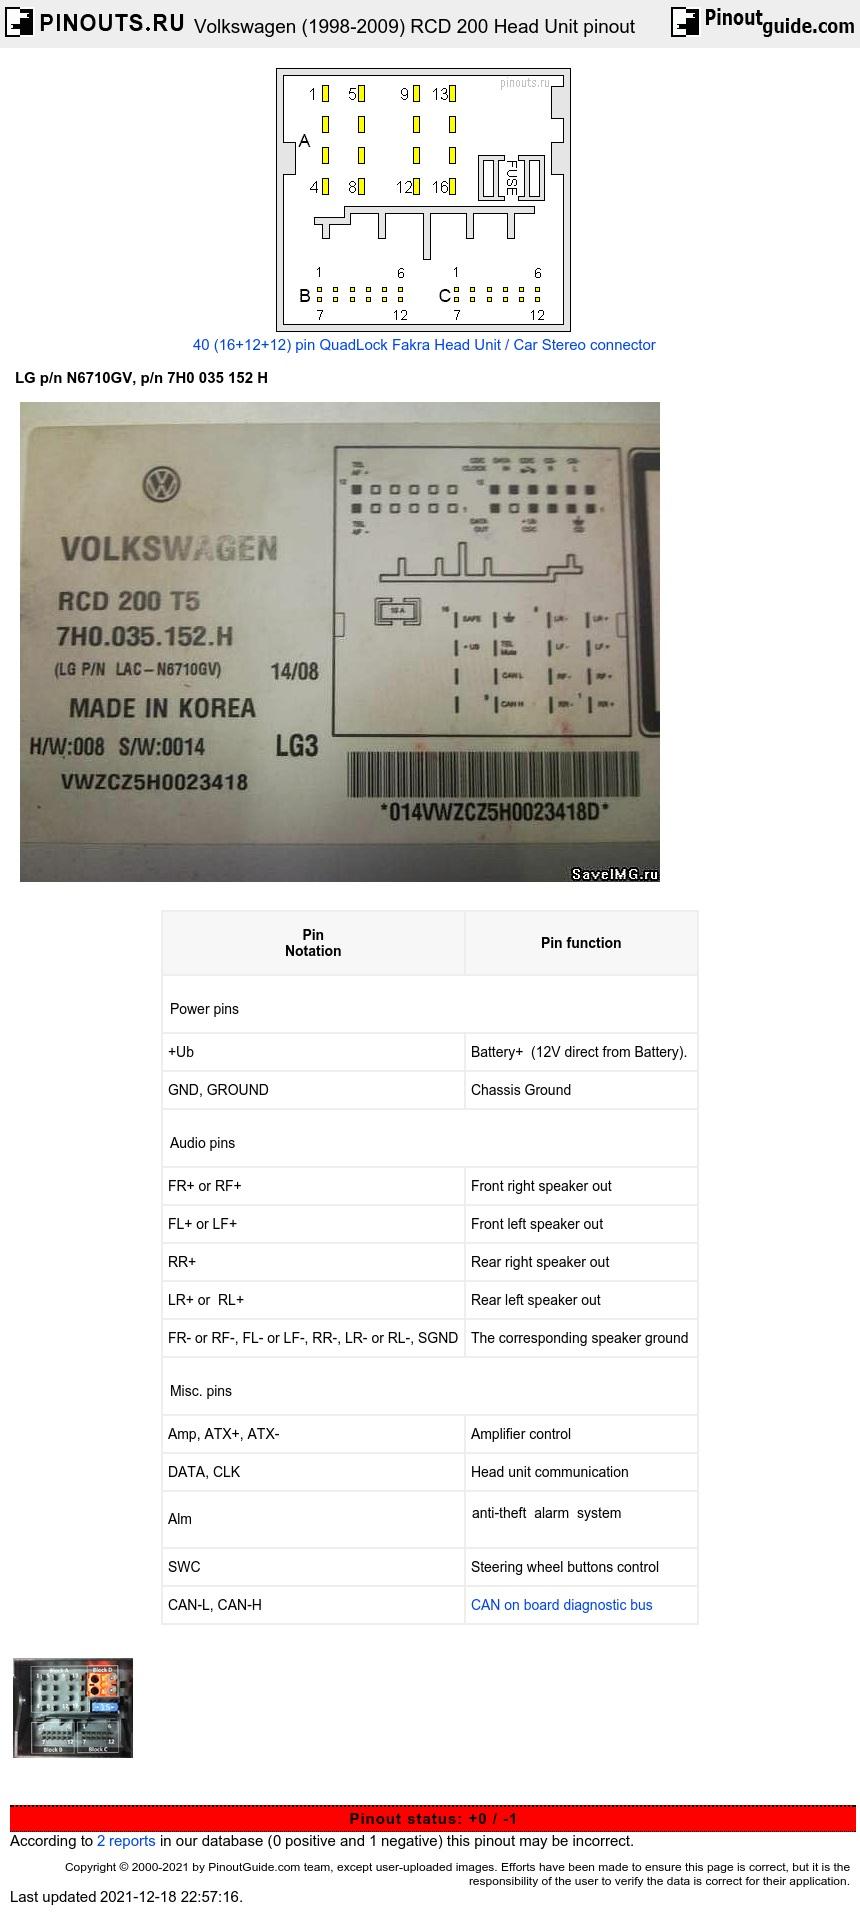 Volkswagen Rcd 200 Head Unit Pinout Diagram   Pinoutguide Com